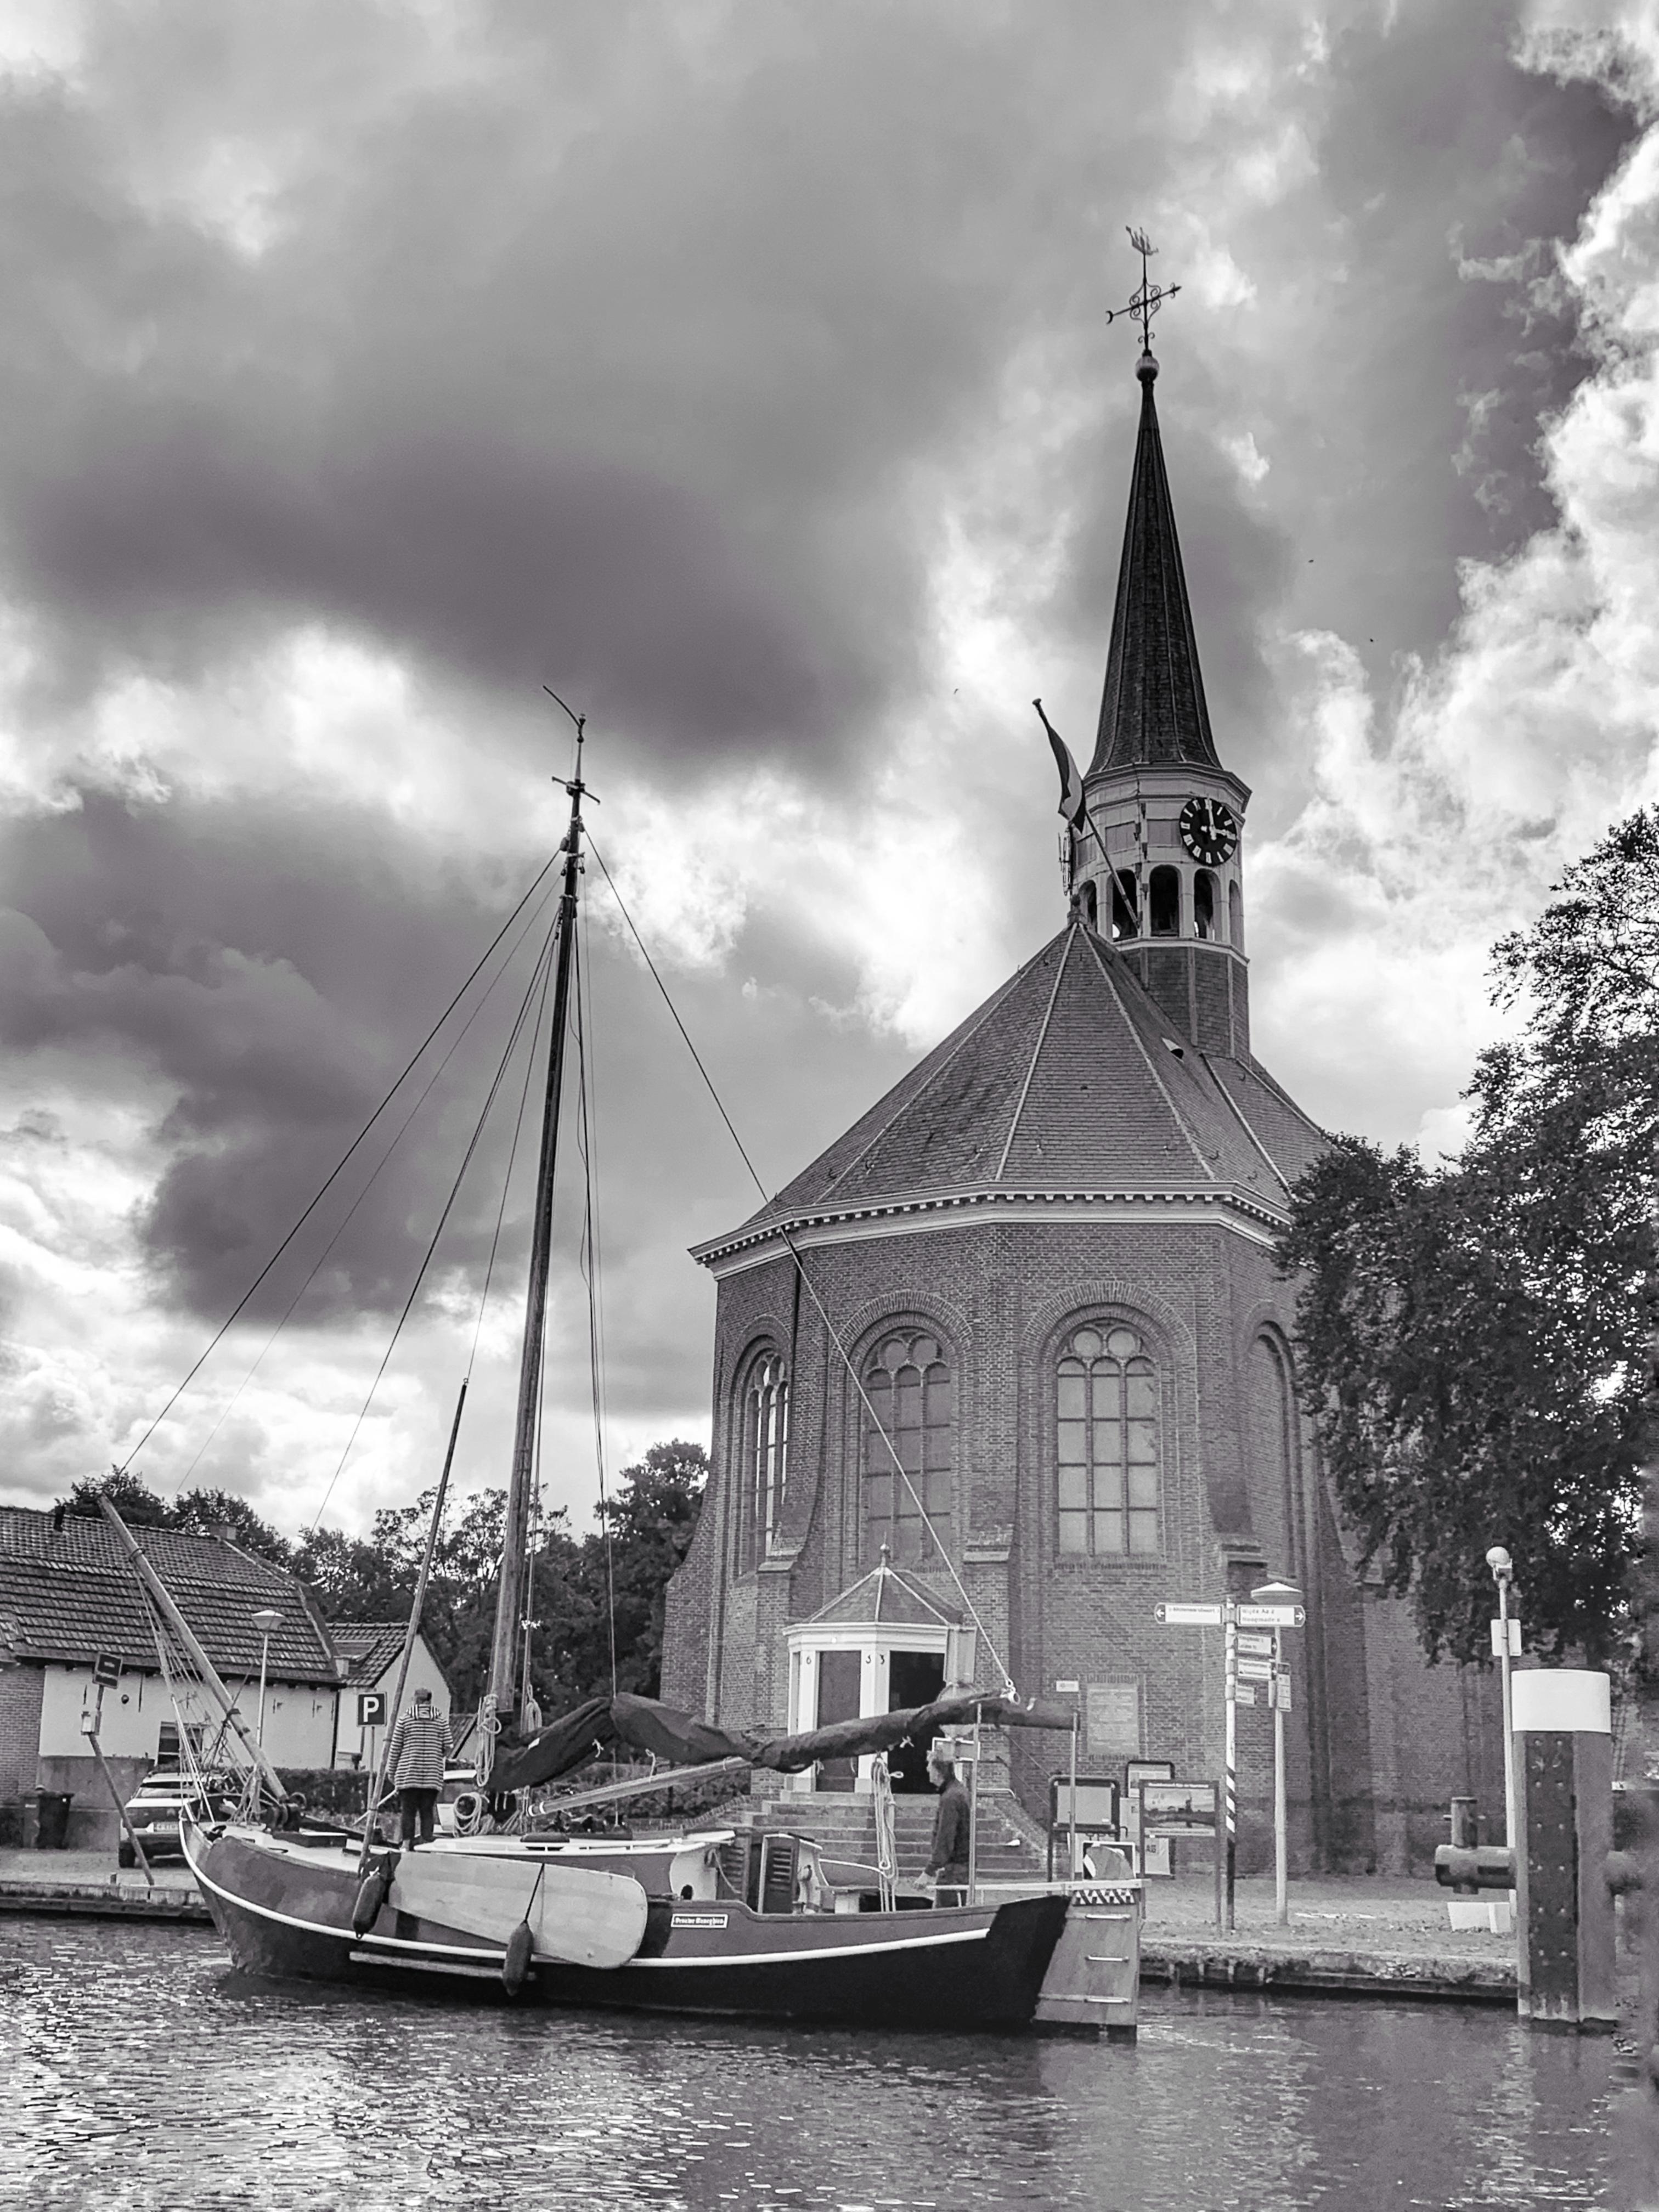 Winnende monumentenfoto in Kaag en Braassem: wat past alles mooi bij elkaar